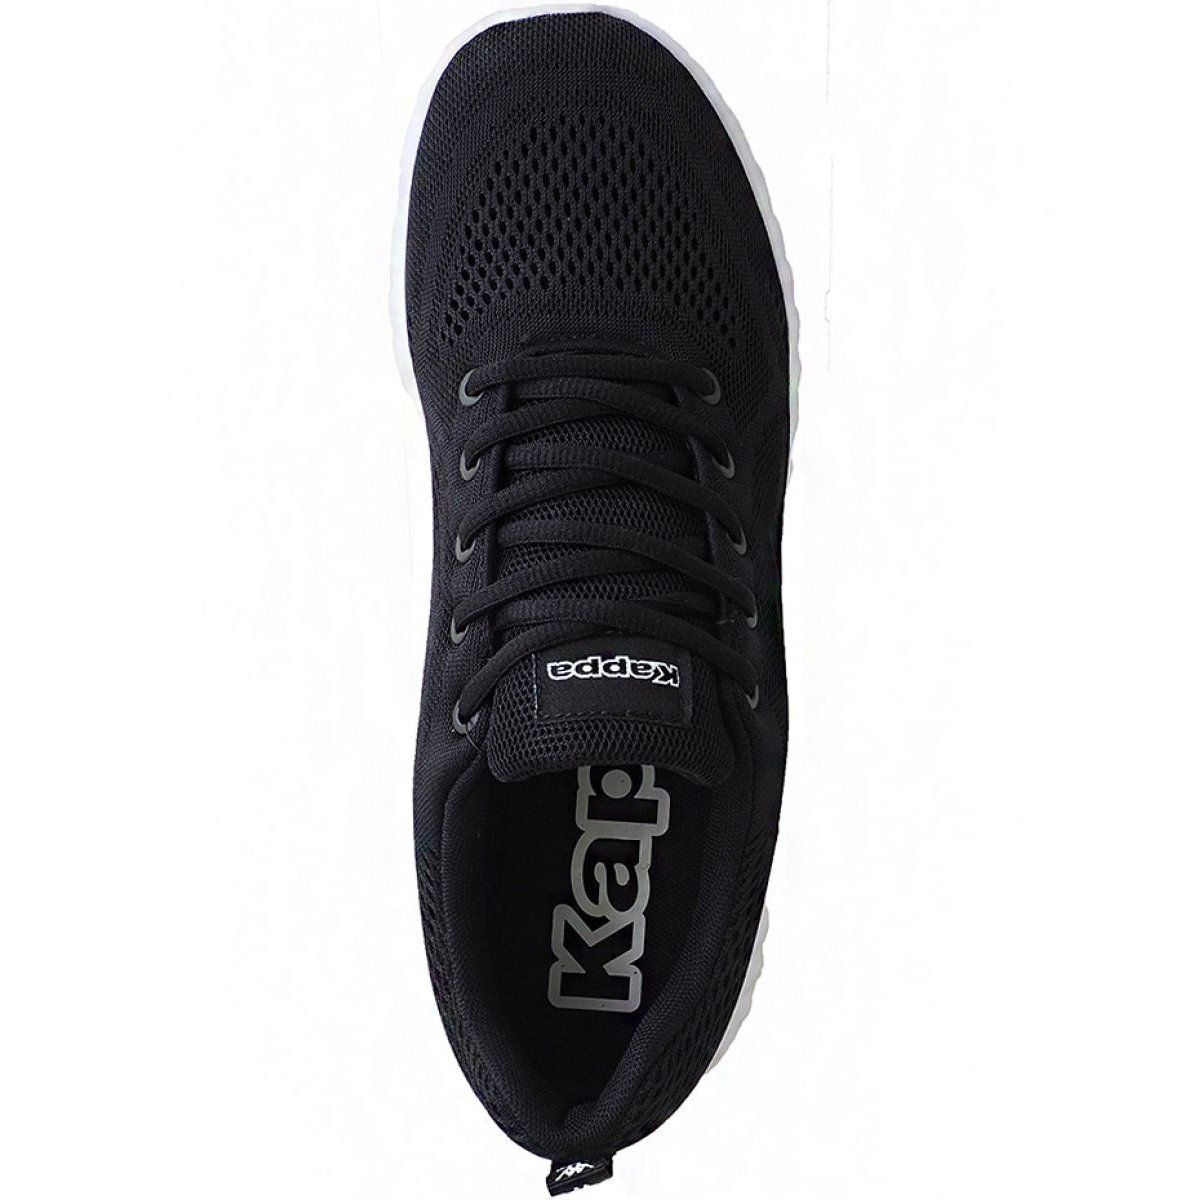 Buty Kappa Affel M 242750 1110 Czarne Black Shoes All Black Sneakers Shoes